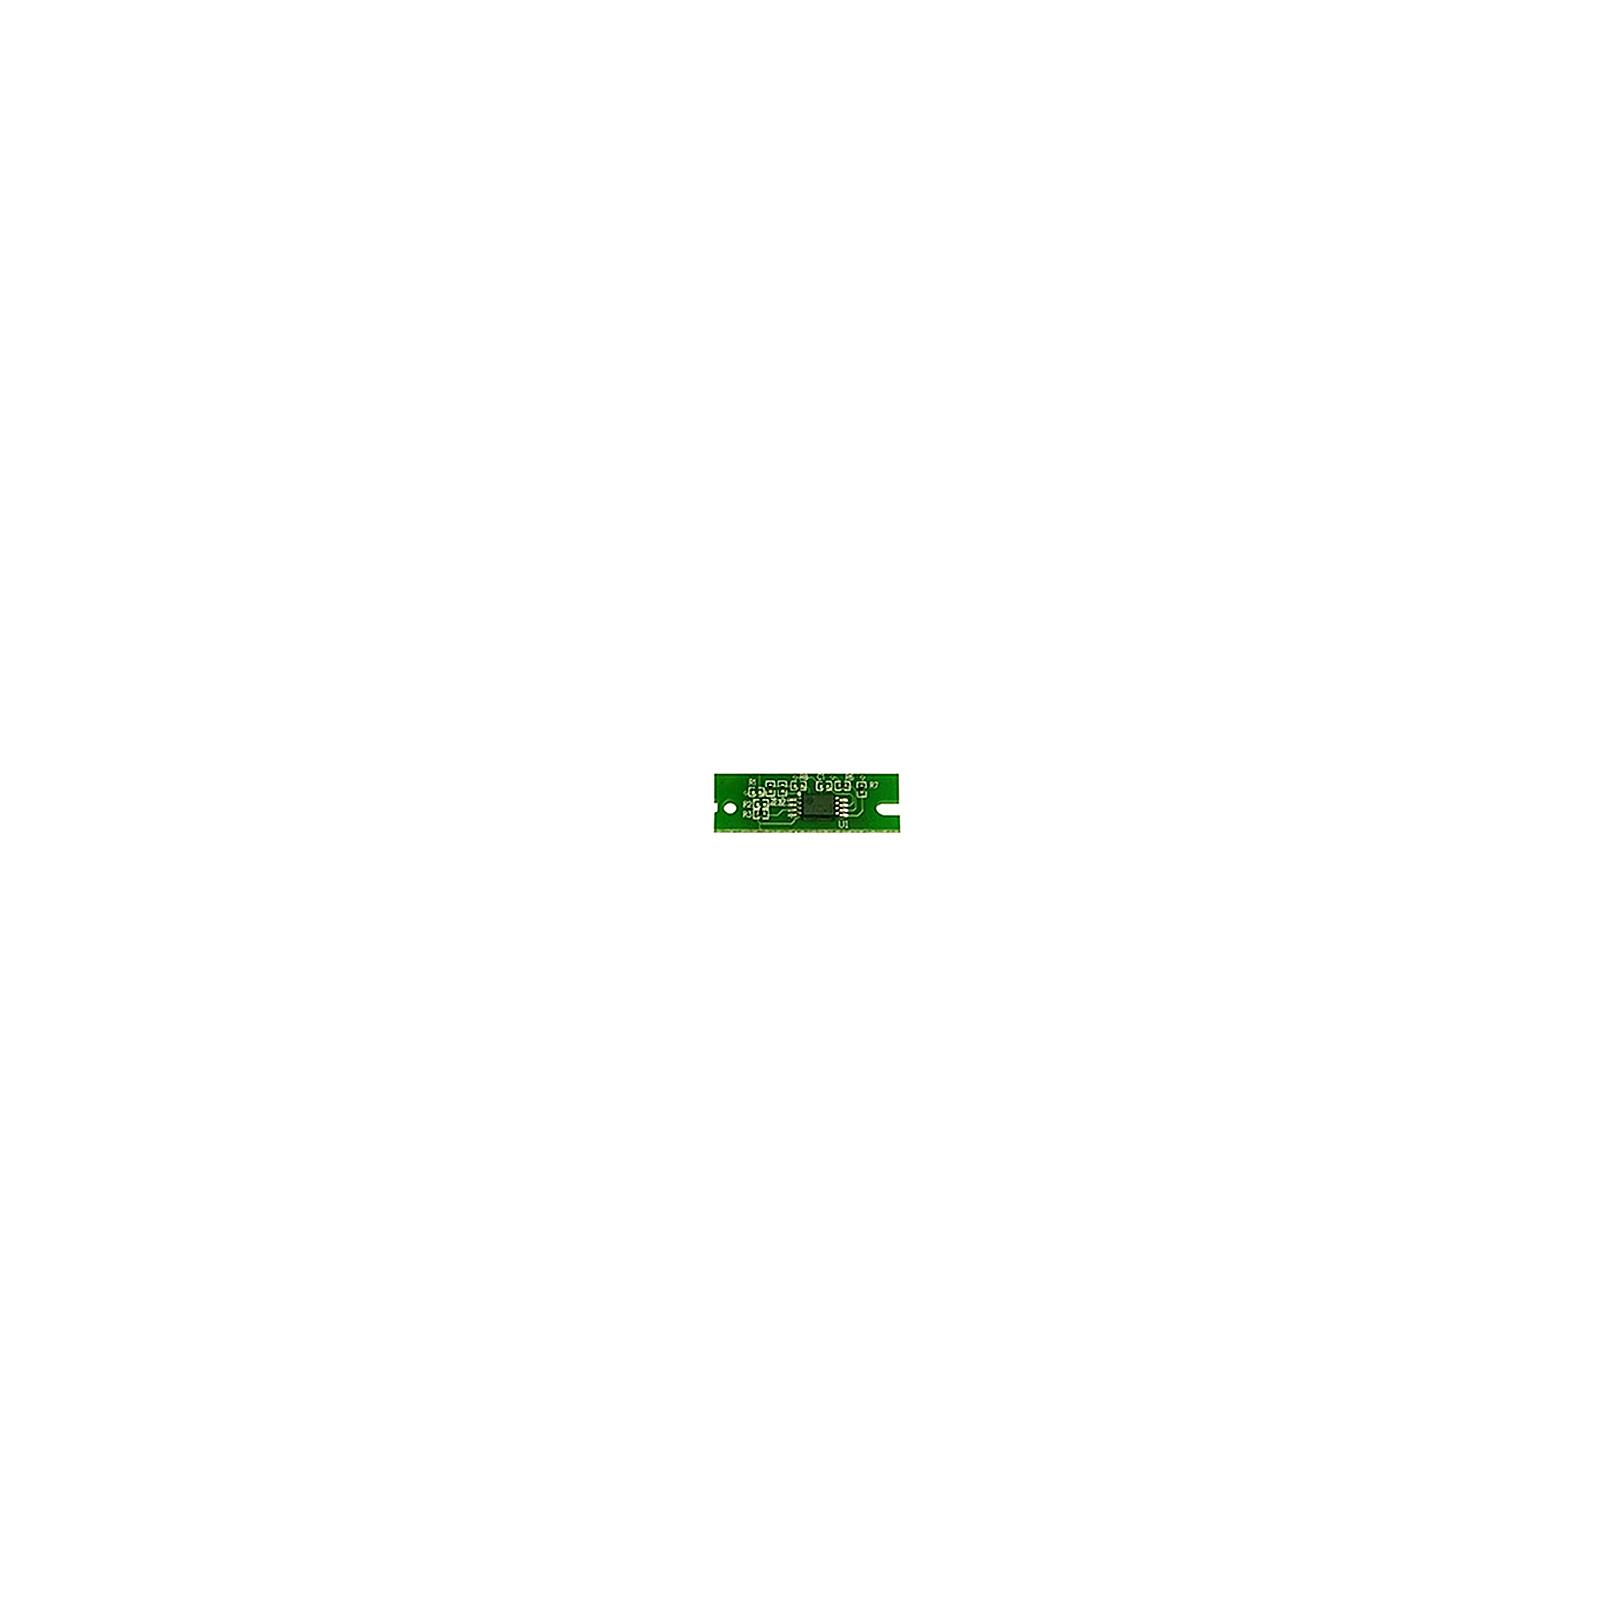 Чип для картриджа Ricoh SP 150 (407971) 0.7k Static Control (R150CP-EU)